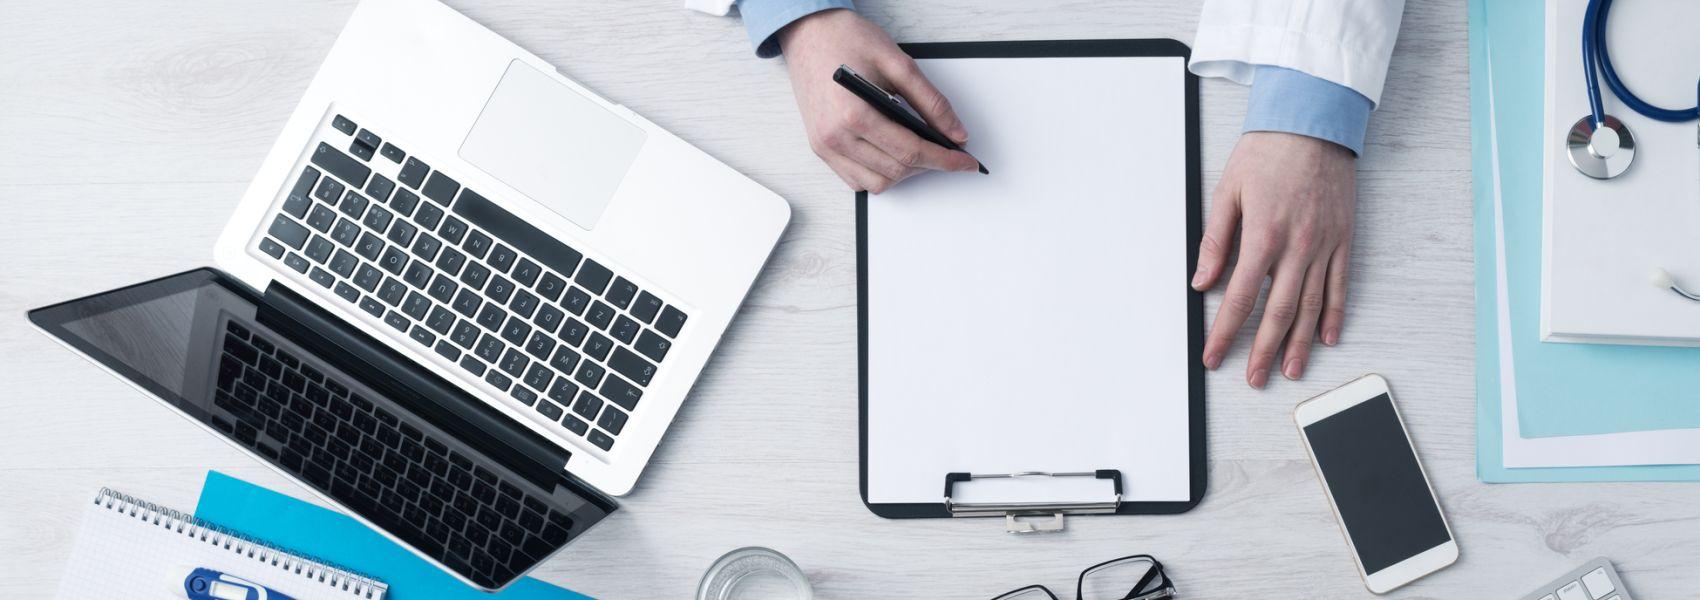 True Security Goes Beyond HIPAA Compliance